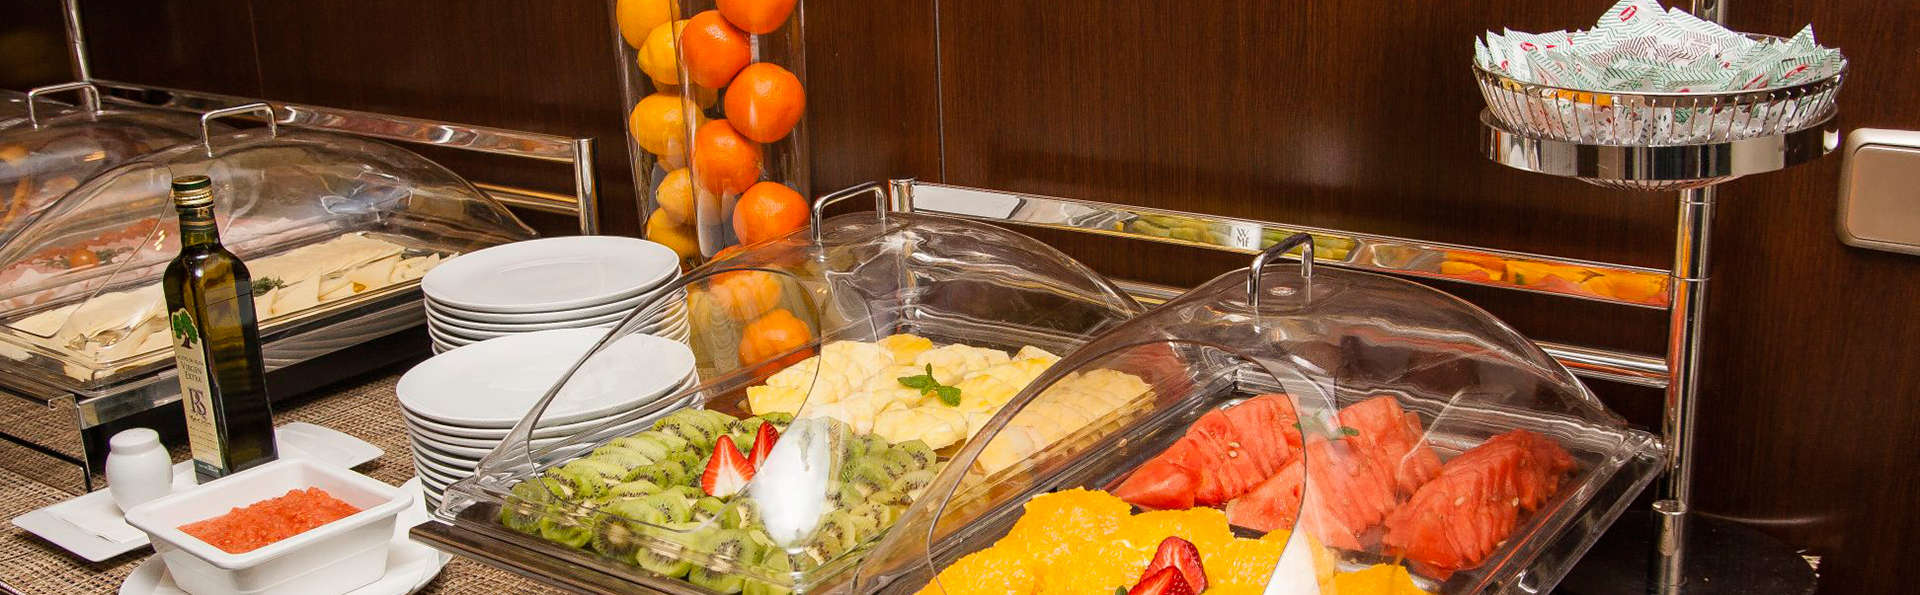 Gran Hotel Attica21 las Rozas - EDIT_buffet1.jpg